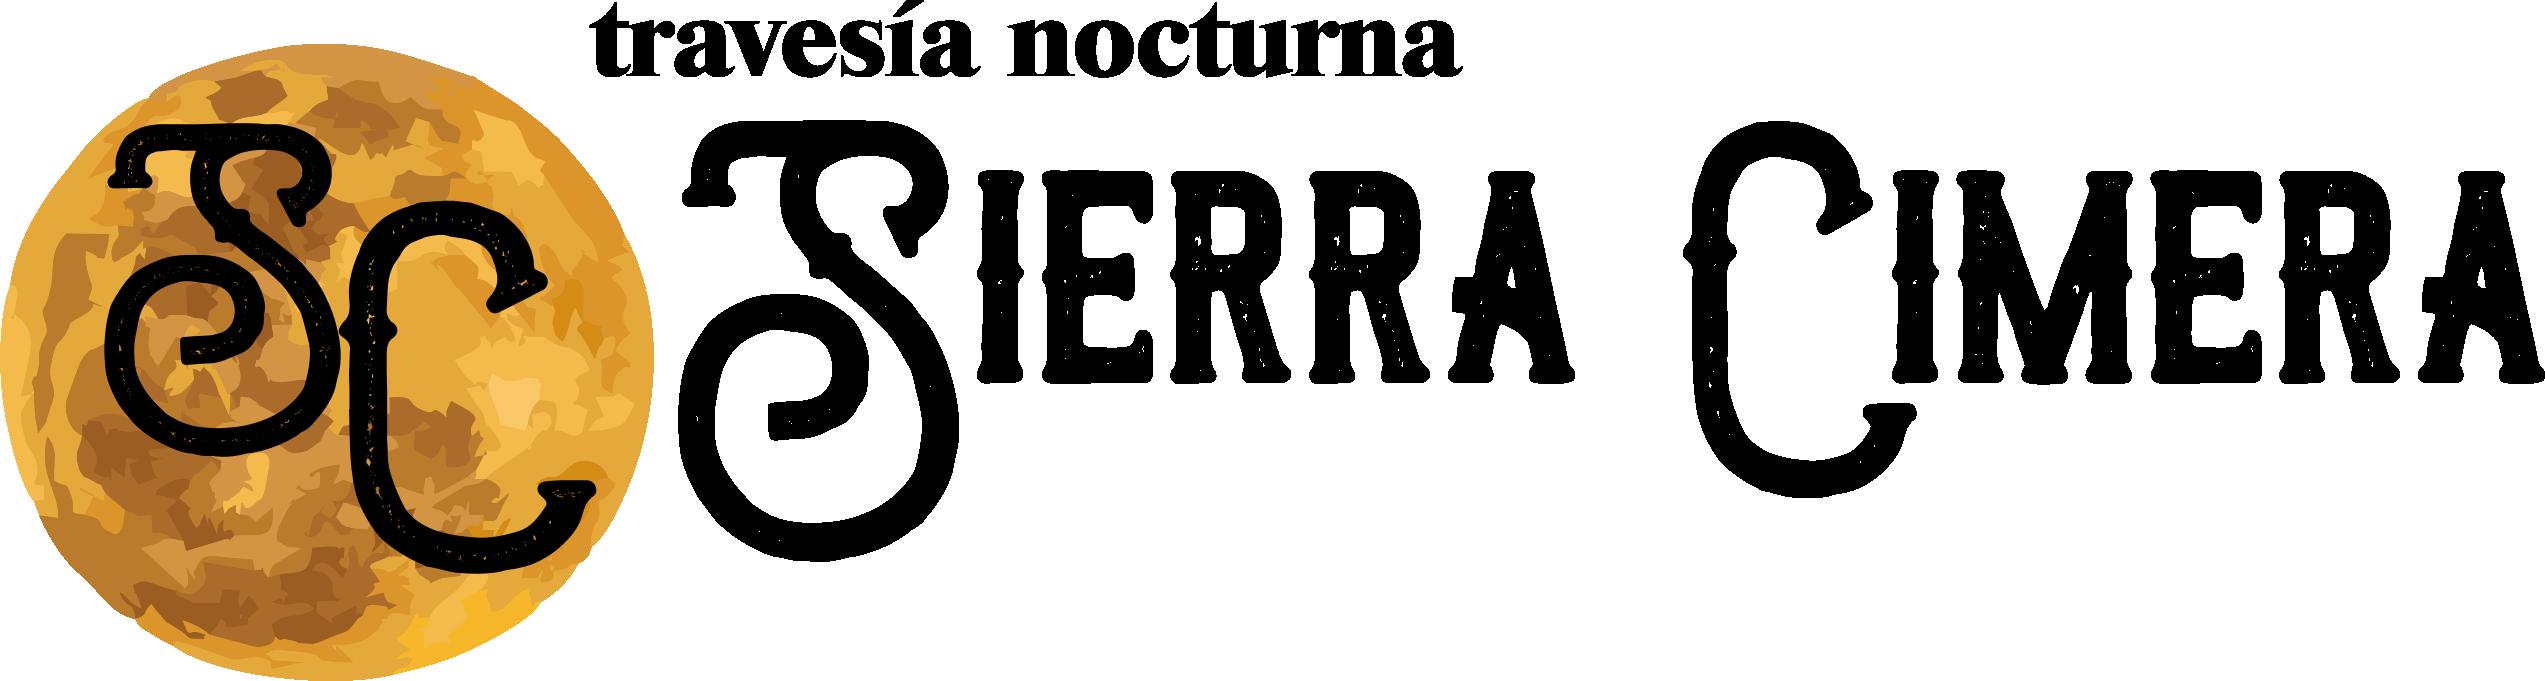 SierraCimera